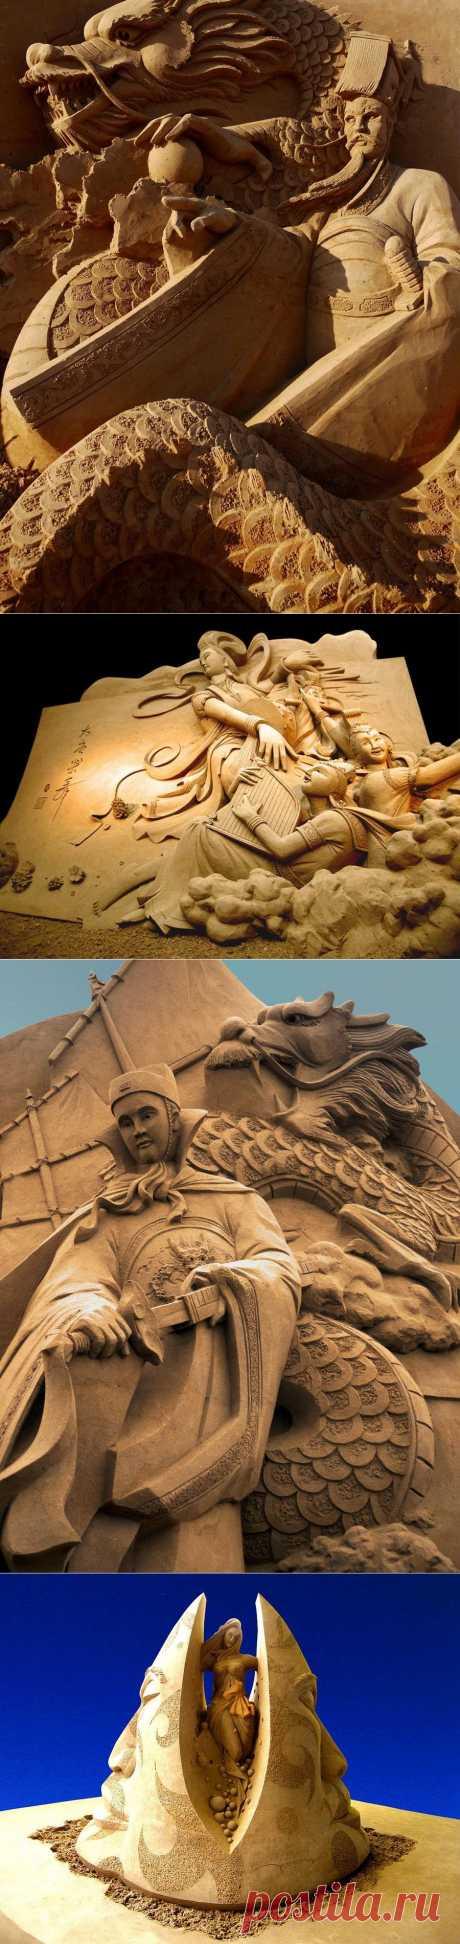 » Песчаная скульптура от Joo Heng Tan Это интересно!